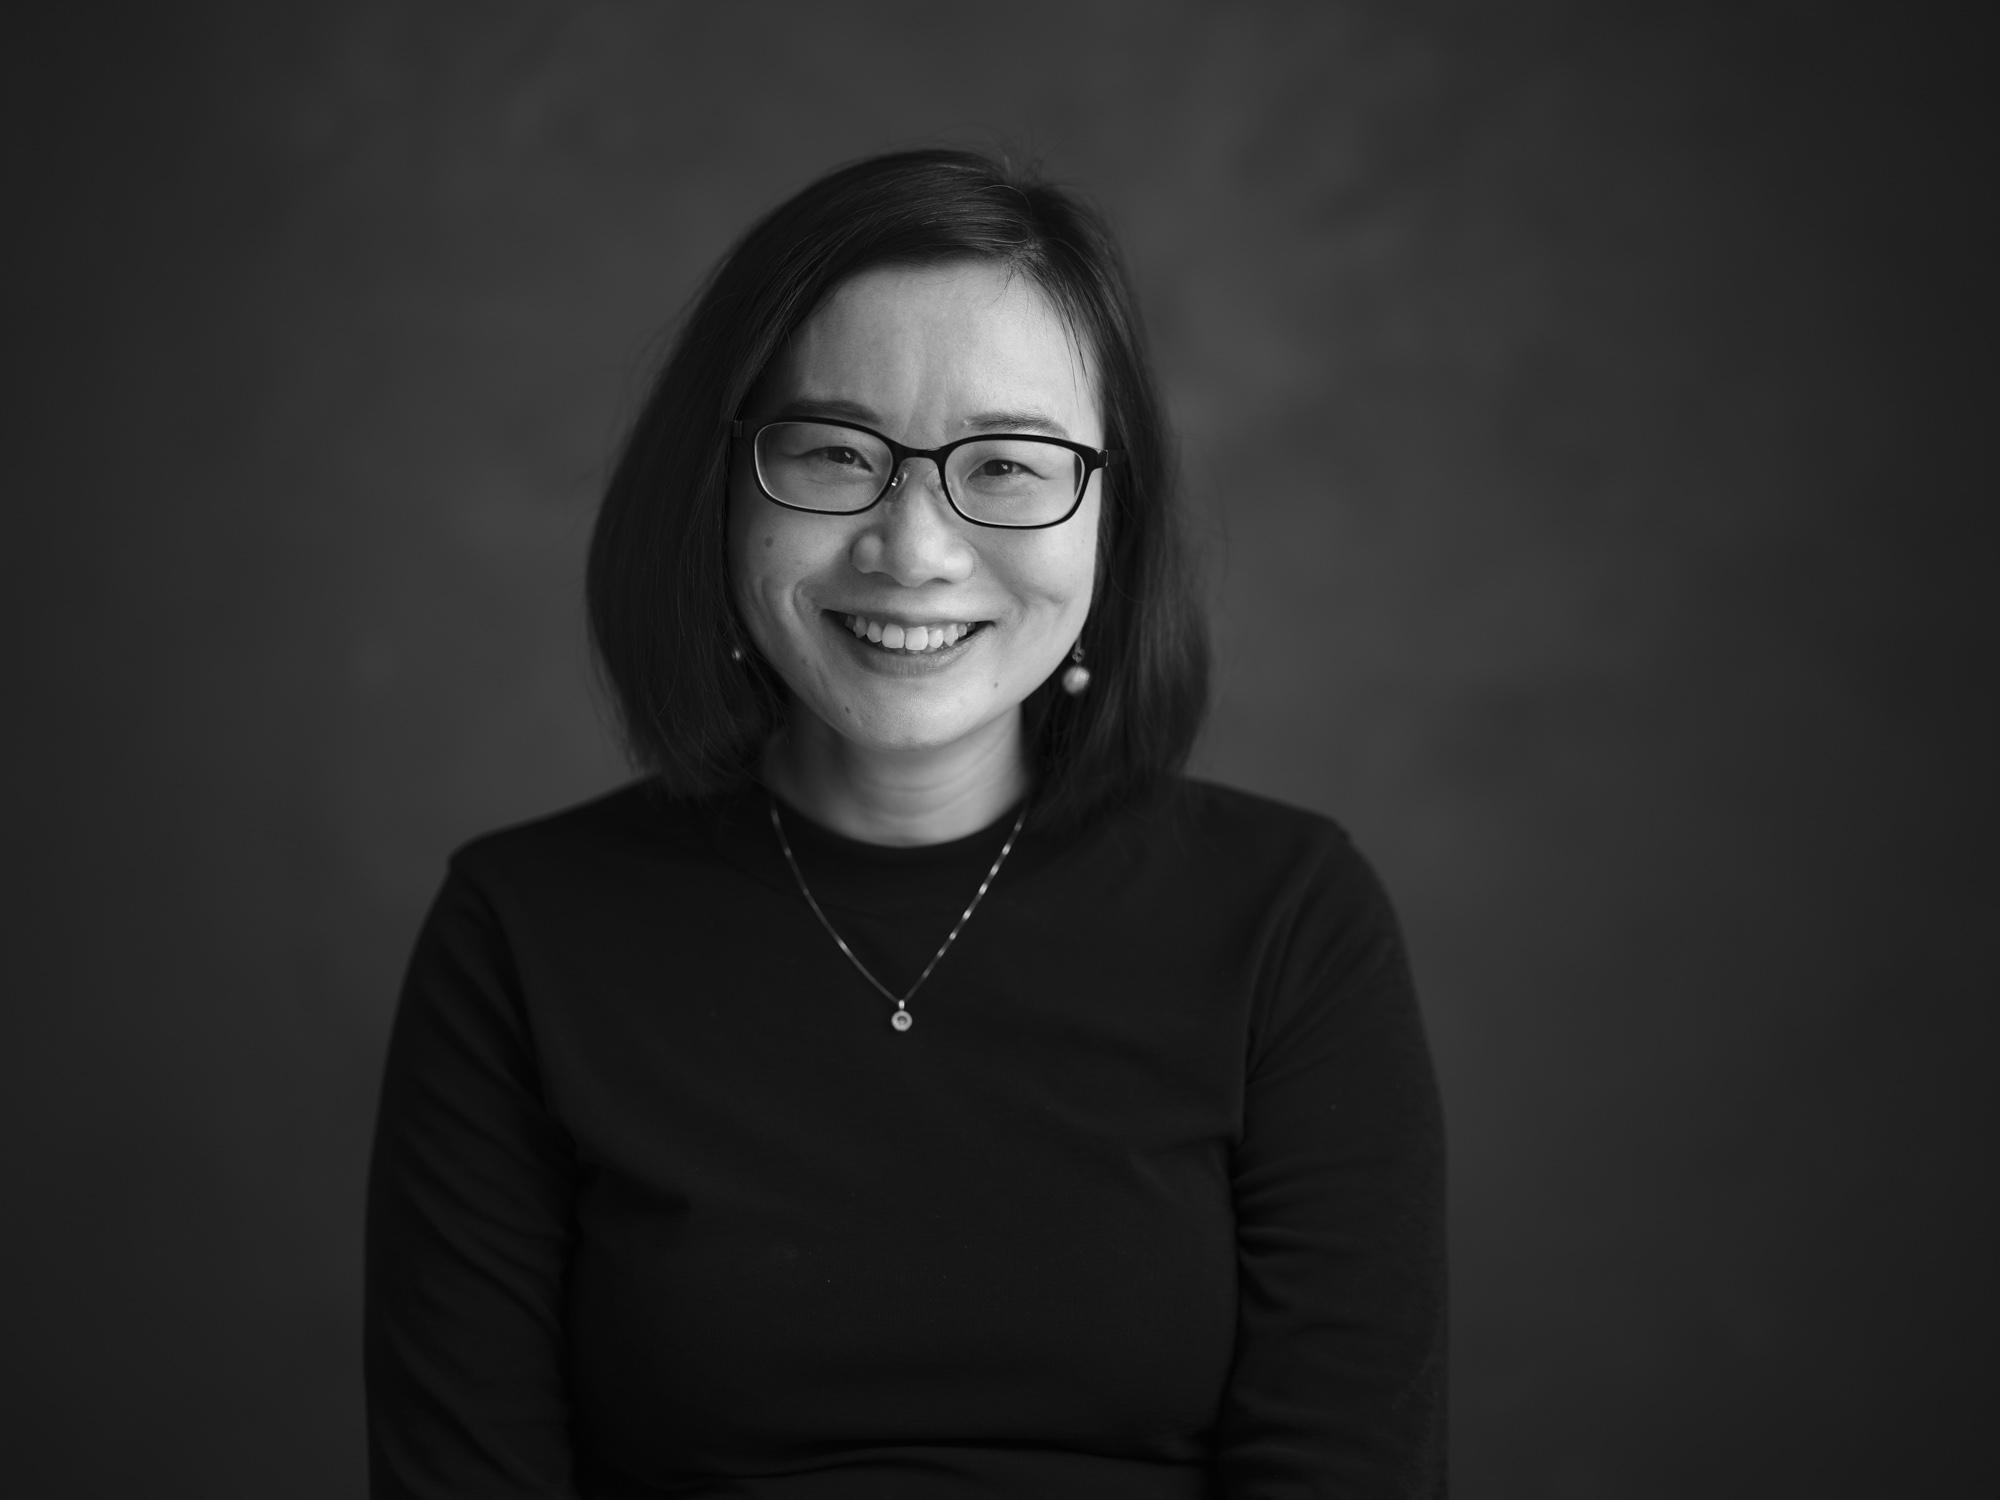 Headshot Photography Black and White Portrait Photographer Singapore COCO Creative Studio 30074